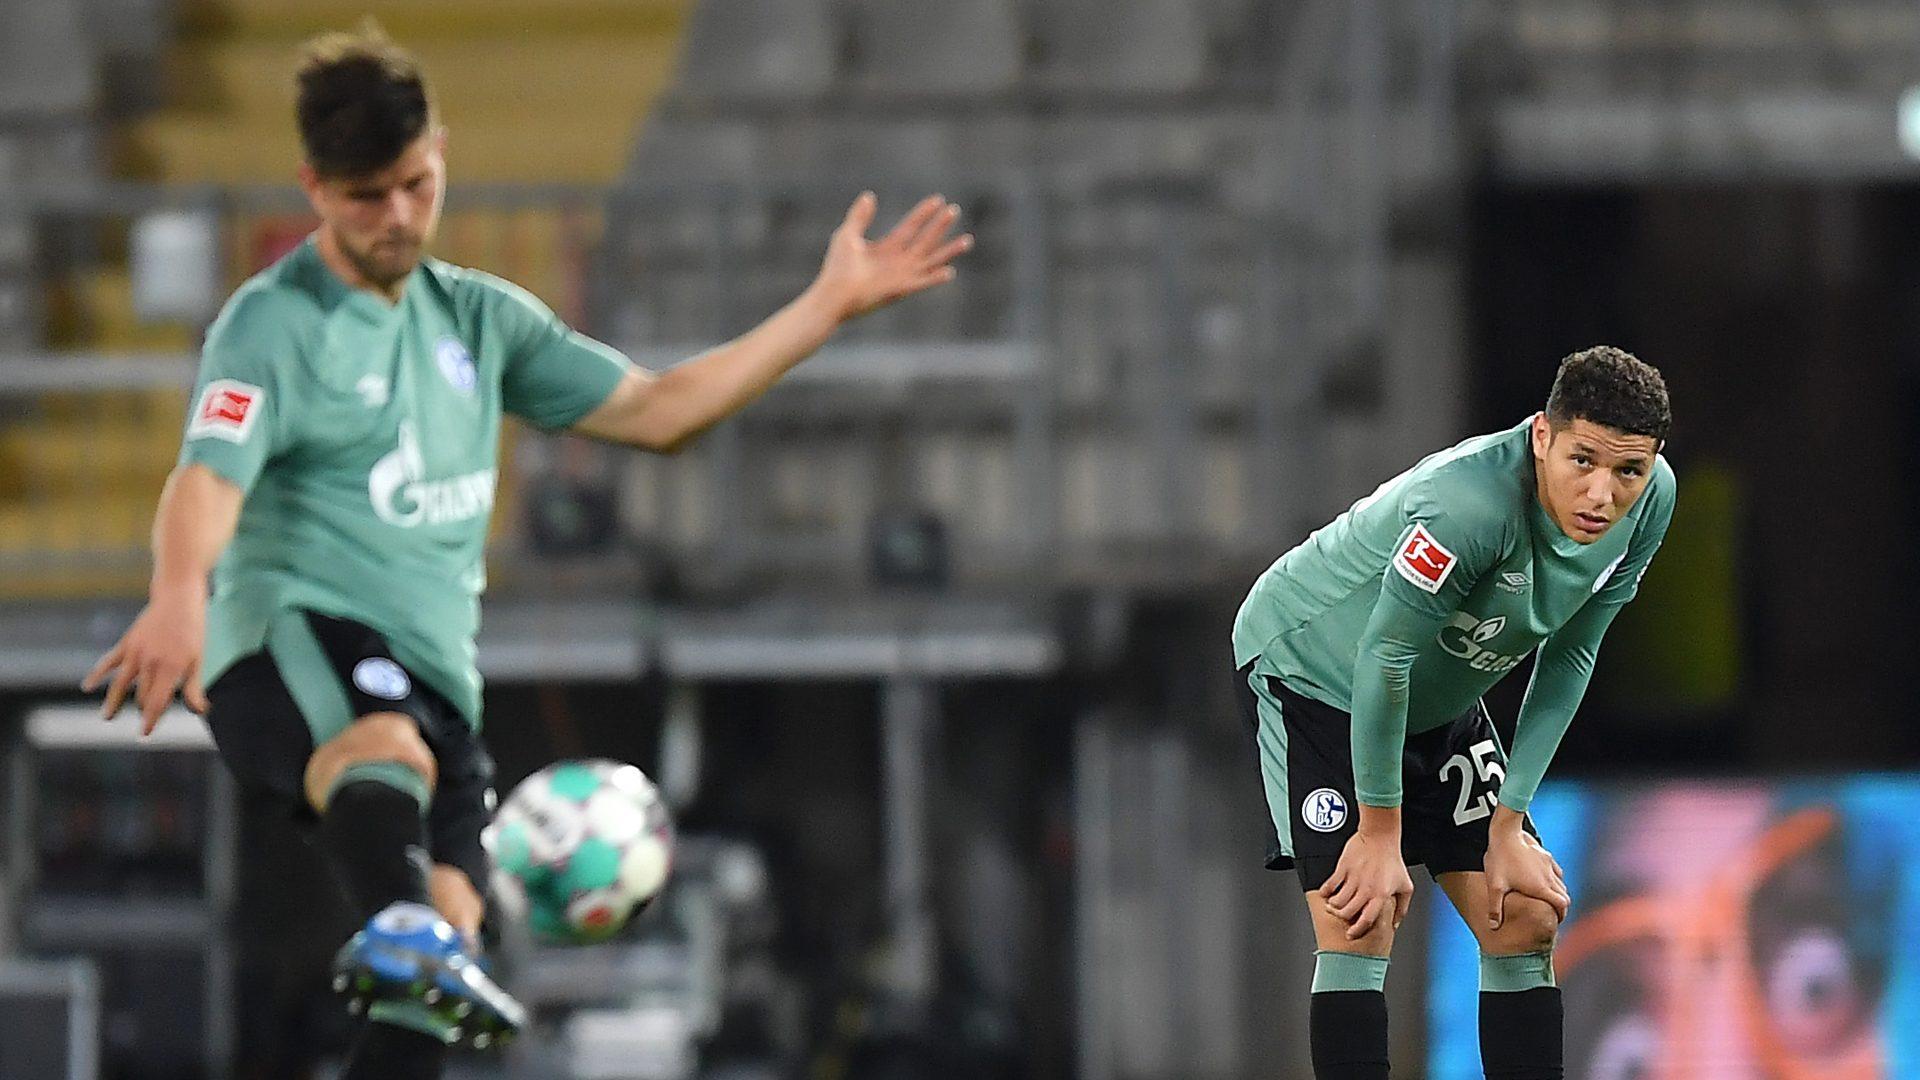 Bundesliga | Schalke relegated to Bundesliga 2 after Arminia Bielefeld  defeat